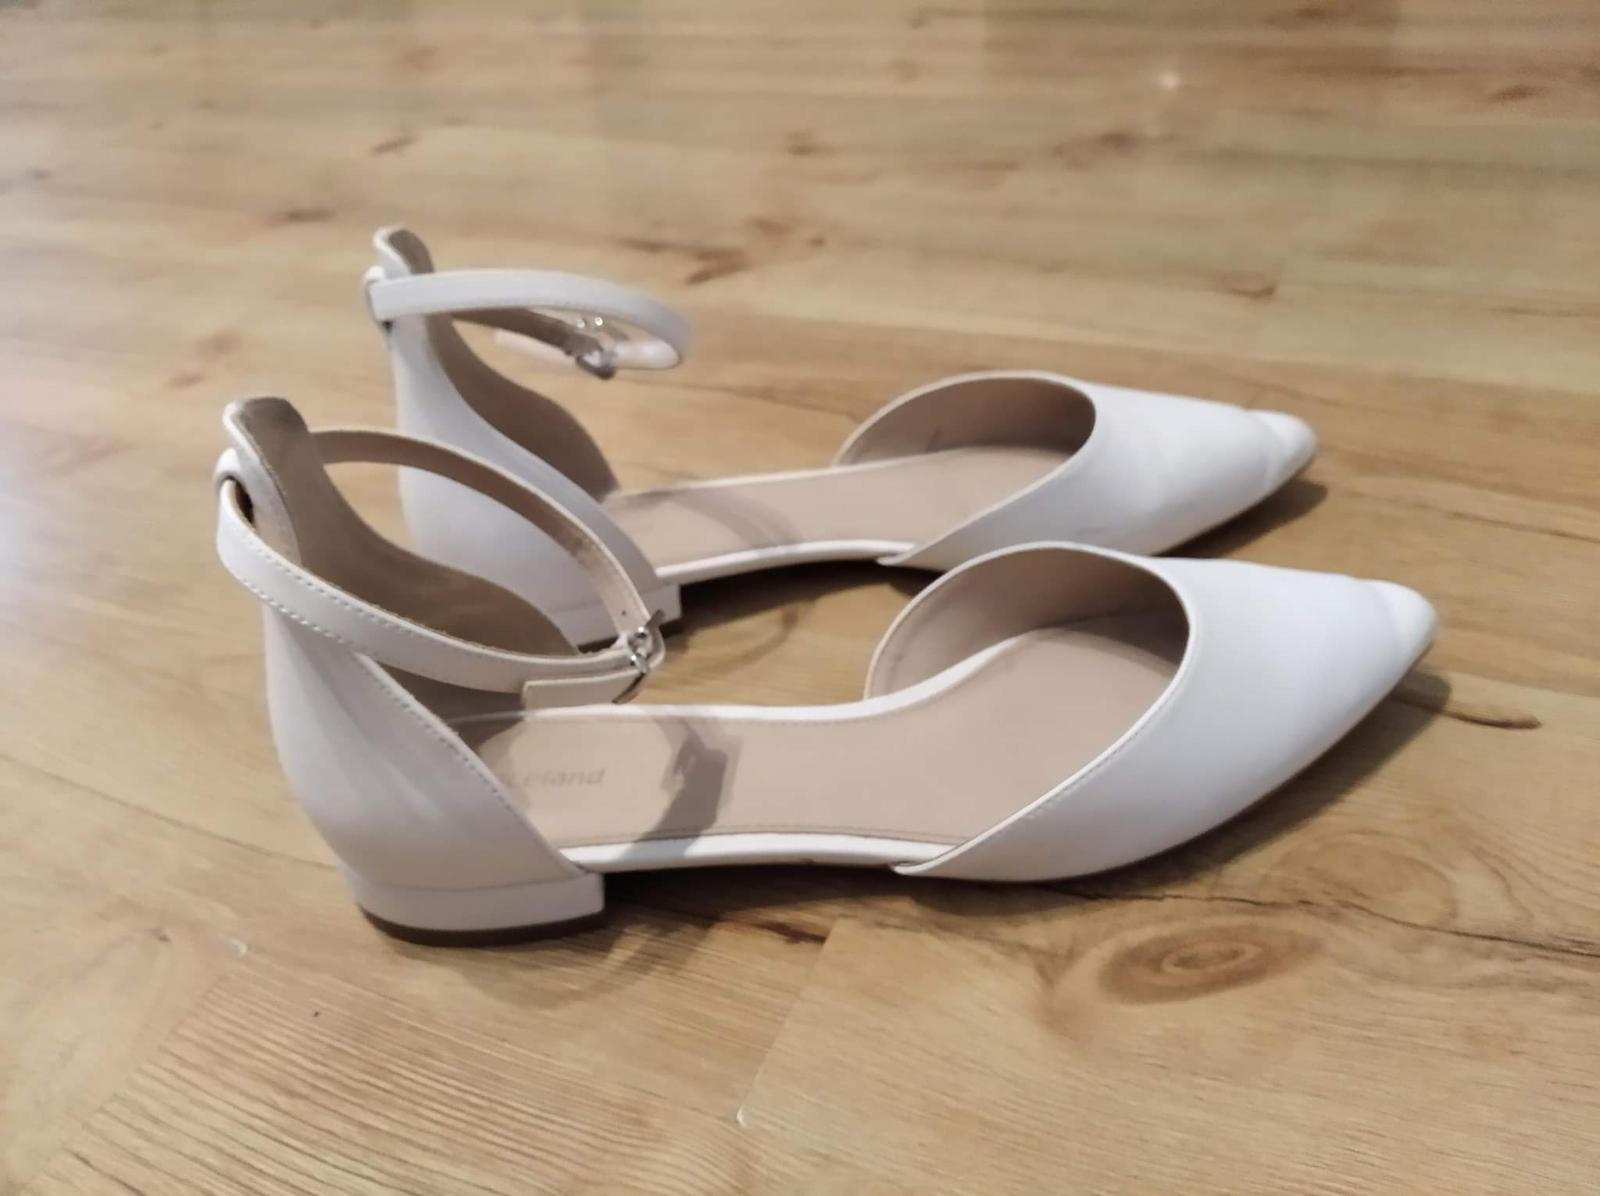 svadobné topánky veľk.41 - Obrázok č. 1